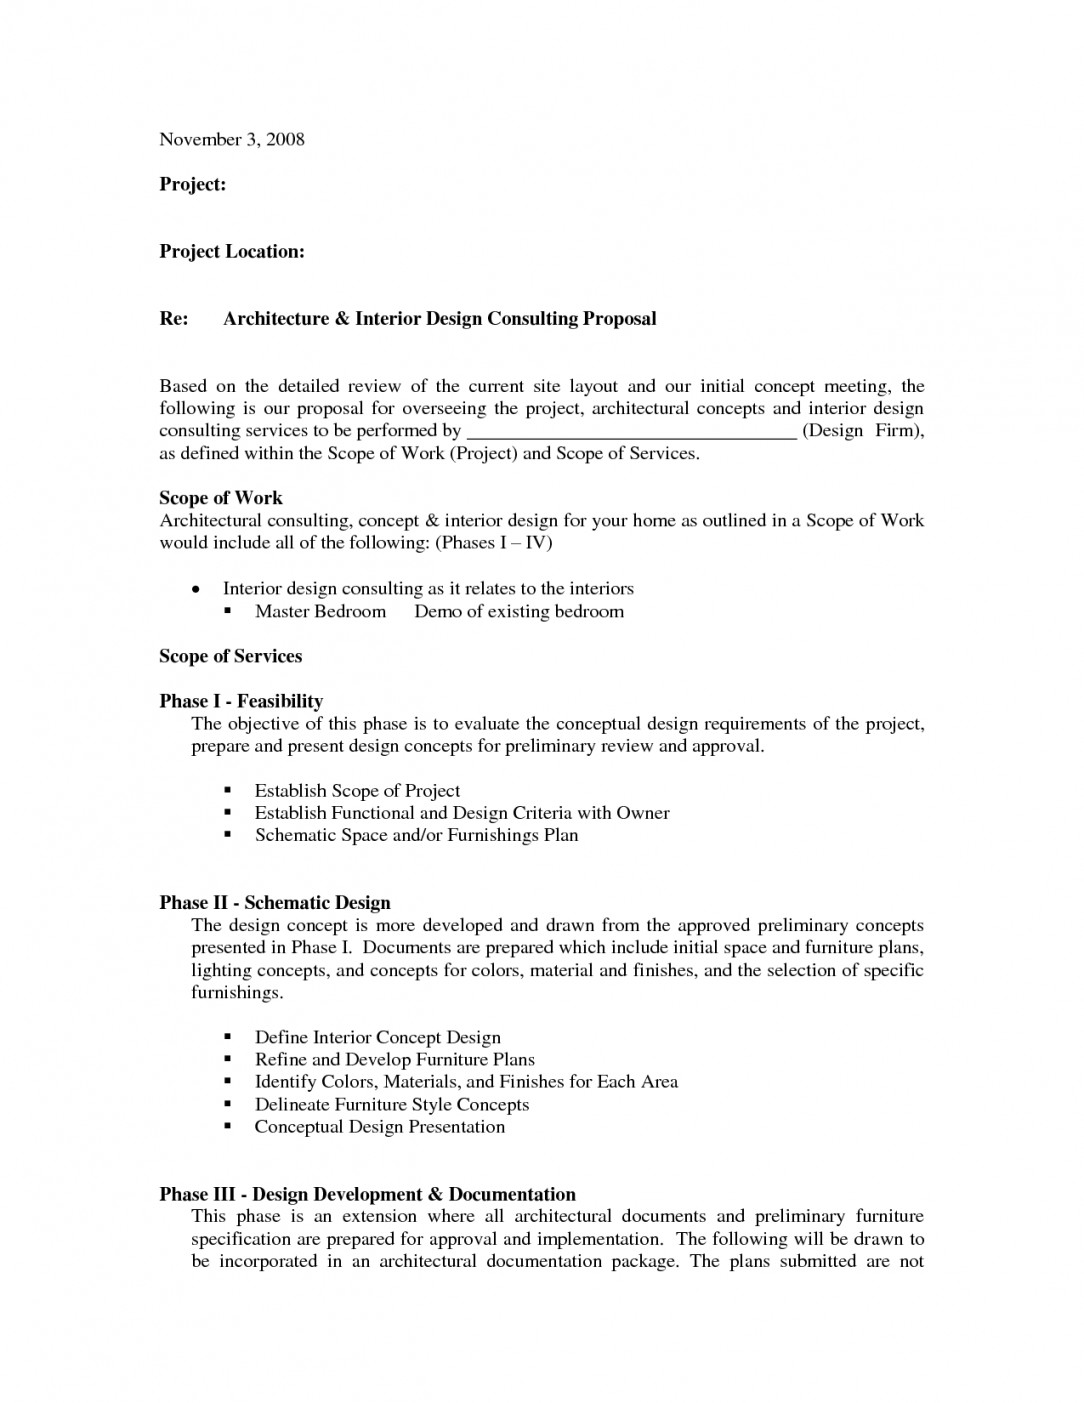 Interior Design Contract Sample Image for Interior Design Quotation Sample